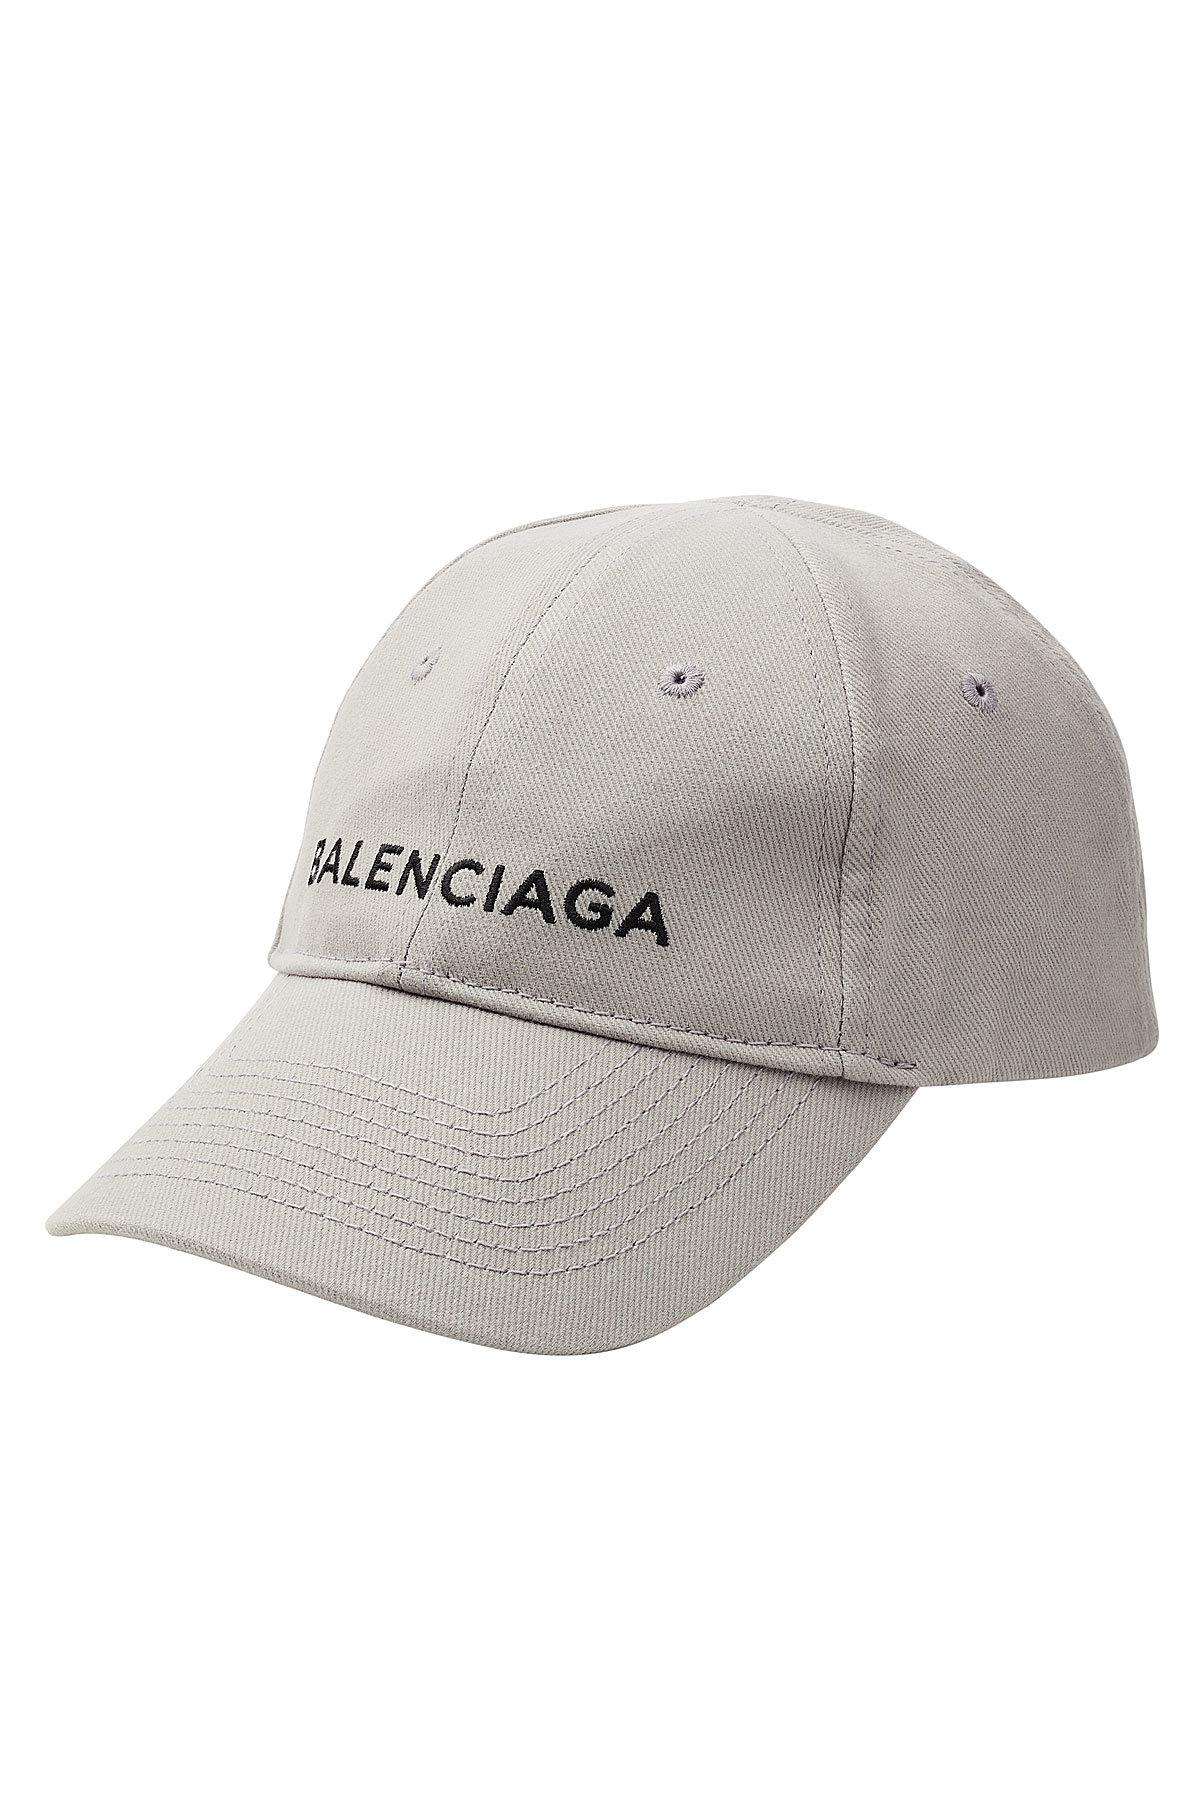 7bd8aaa0c83 Lyst - Balenciaga New Baseball Cap in Gray for Men